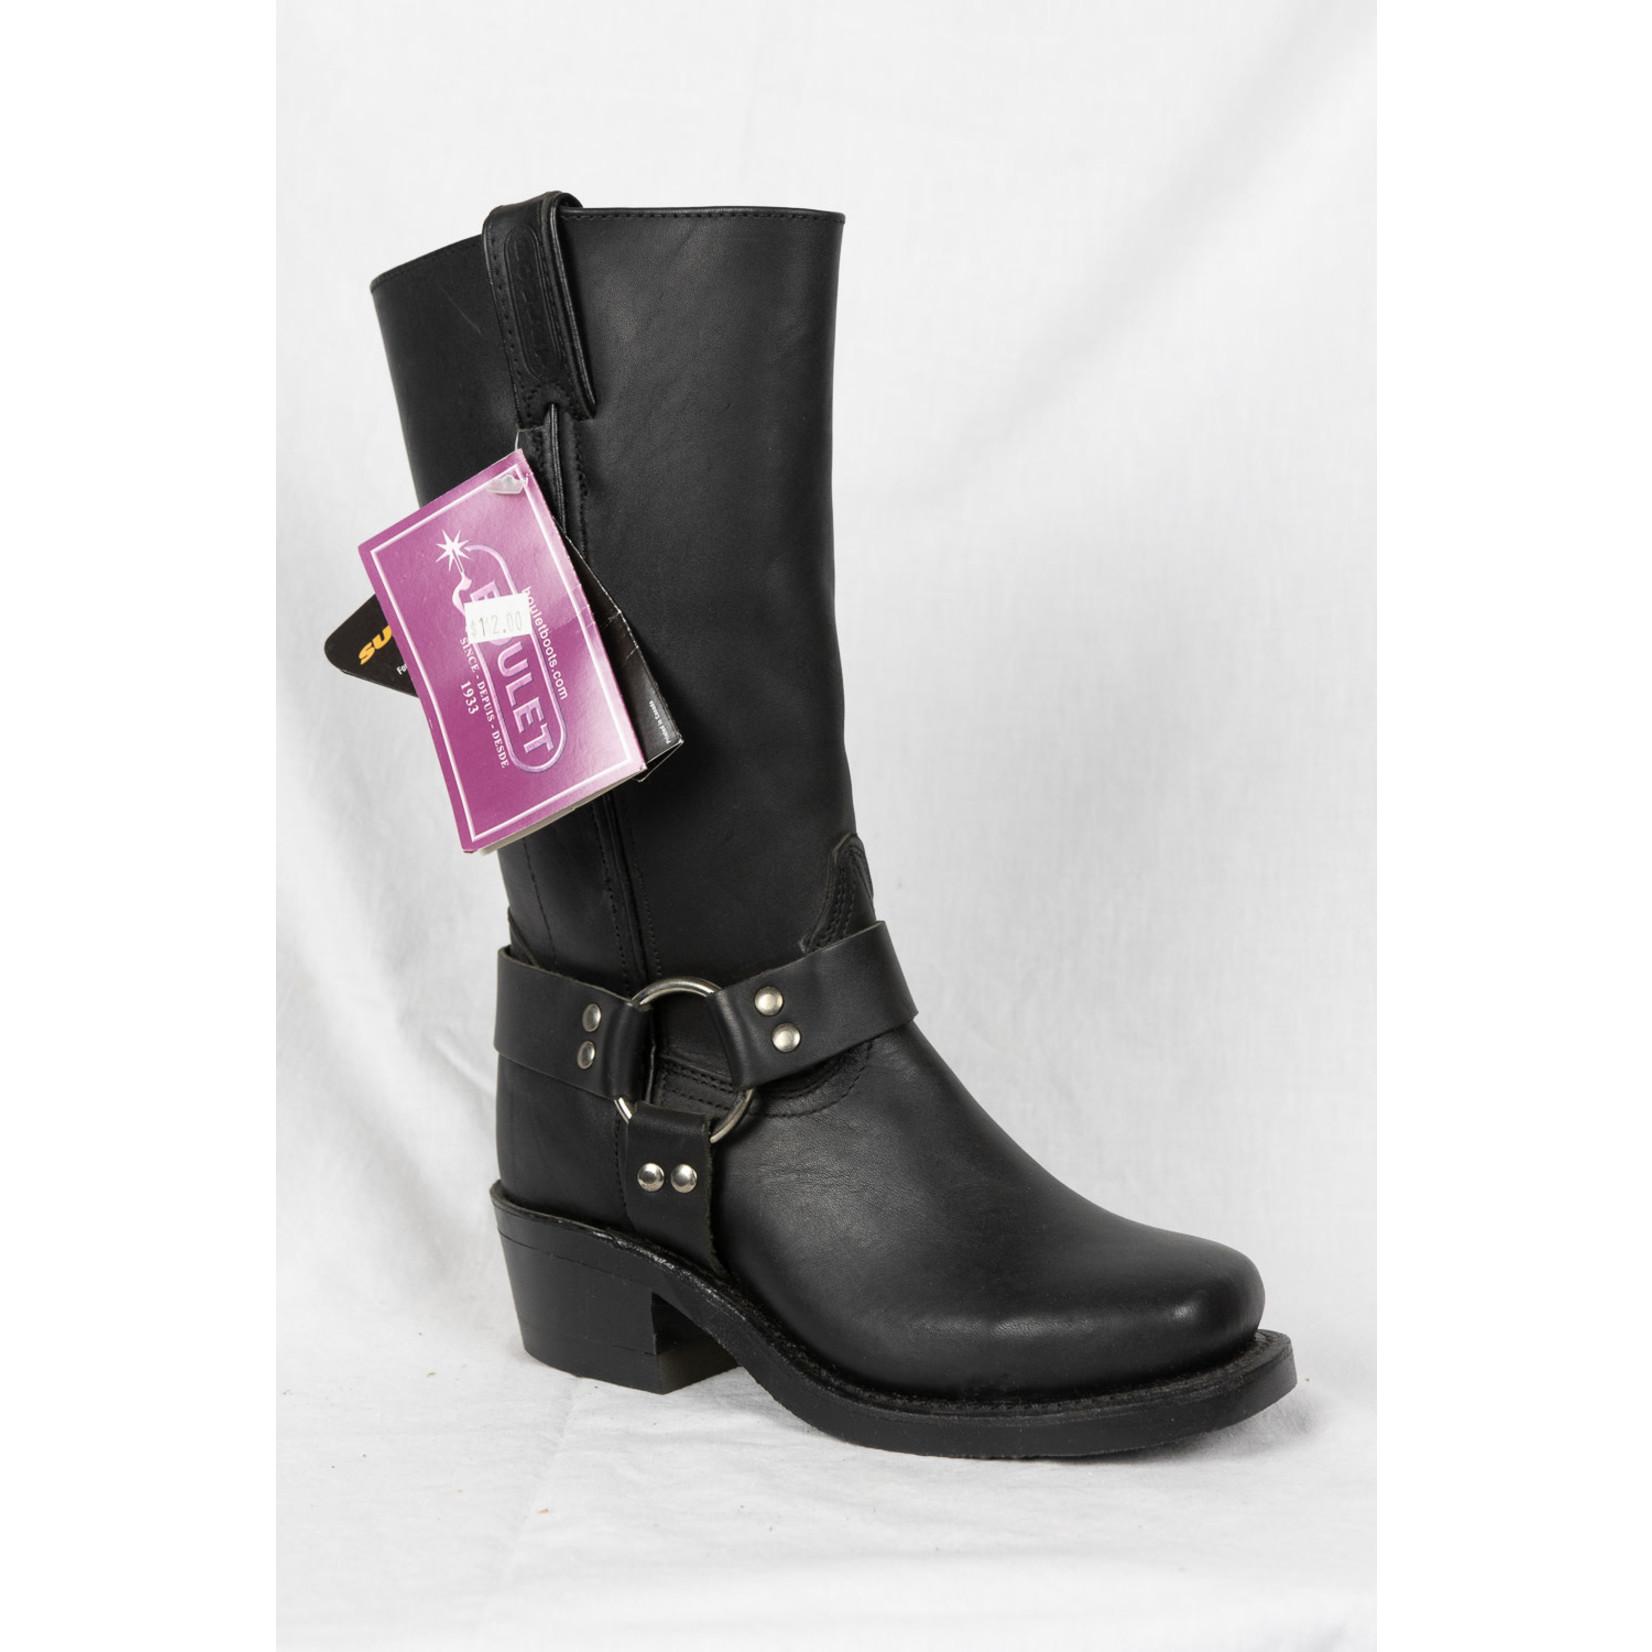 Boulet Boulet Women's Black Leather Biker Boot 2064 Width C